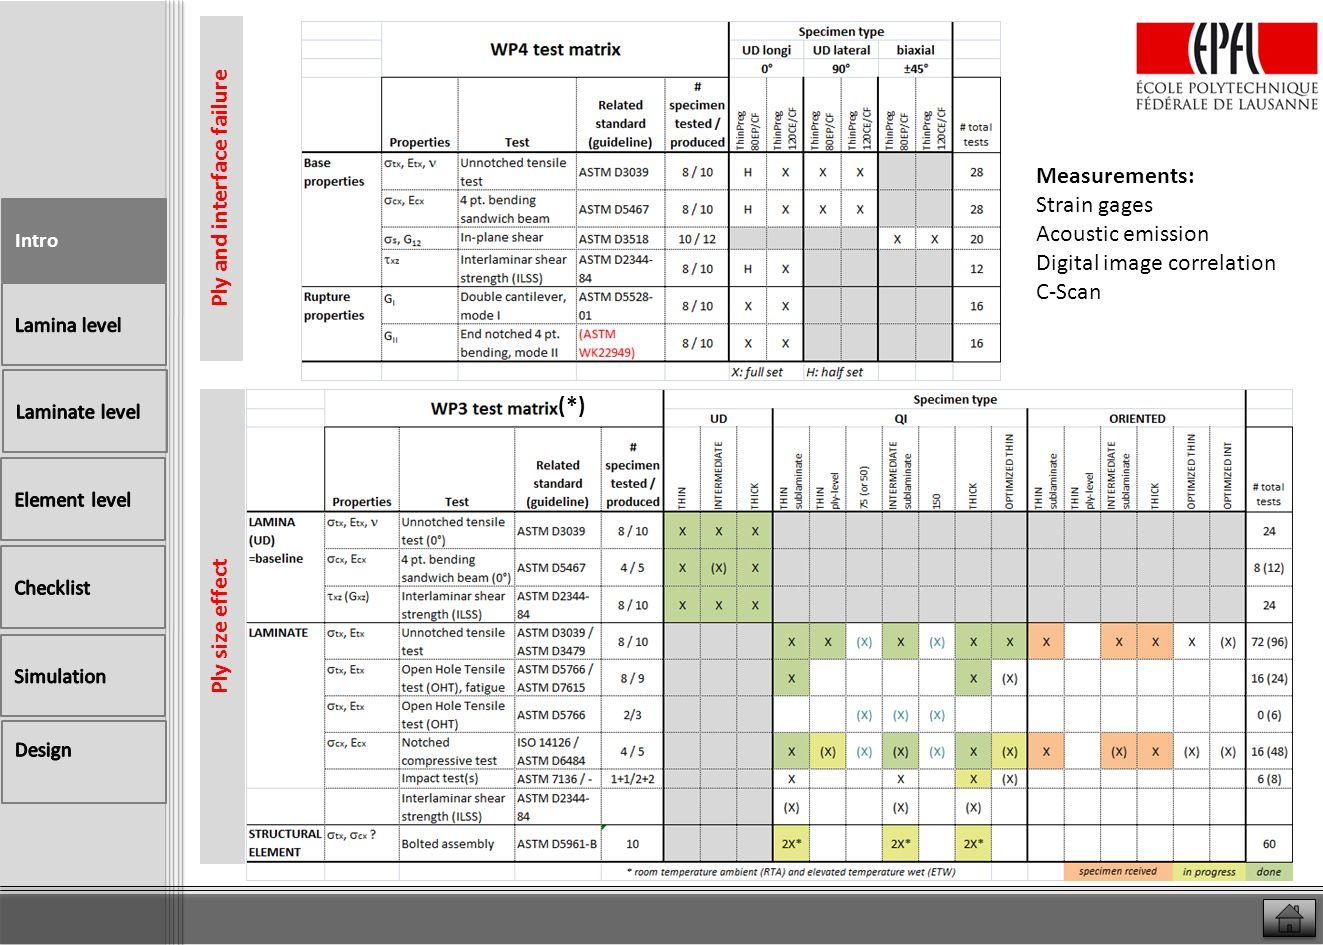 Lamina properties TP80ep/M40JB 55%vol o Overall no change in intrinsic lamina properties except compression ThinPregTM80EP 55%vol M40JB